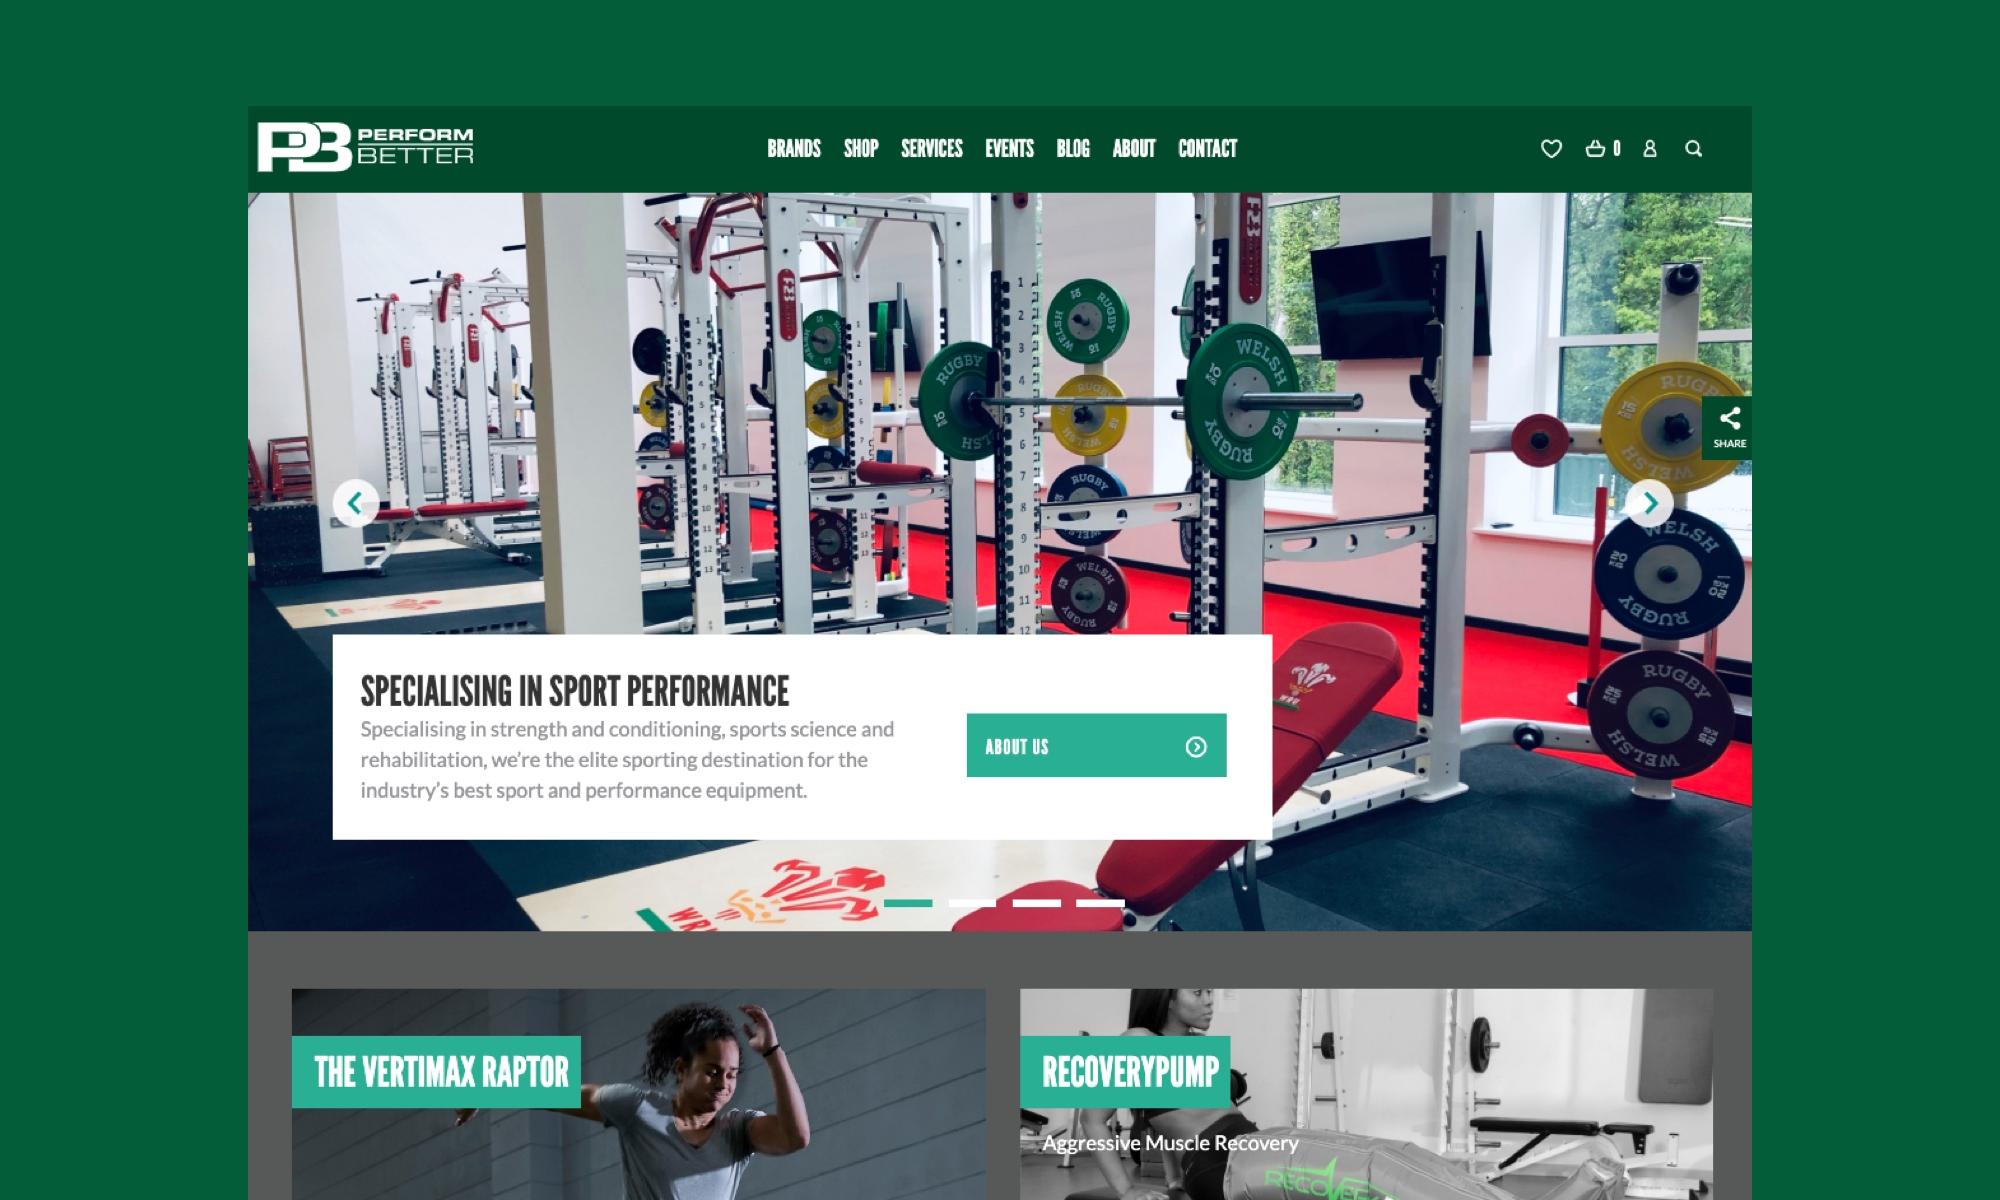 Leicester website design